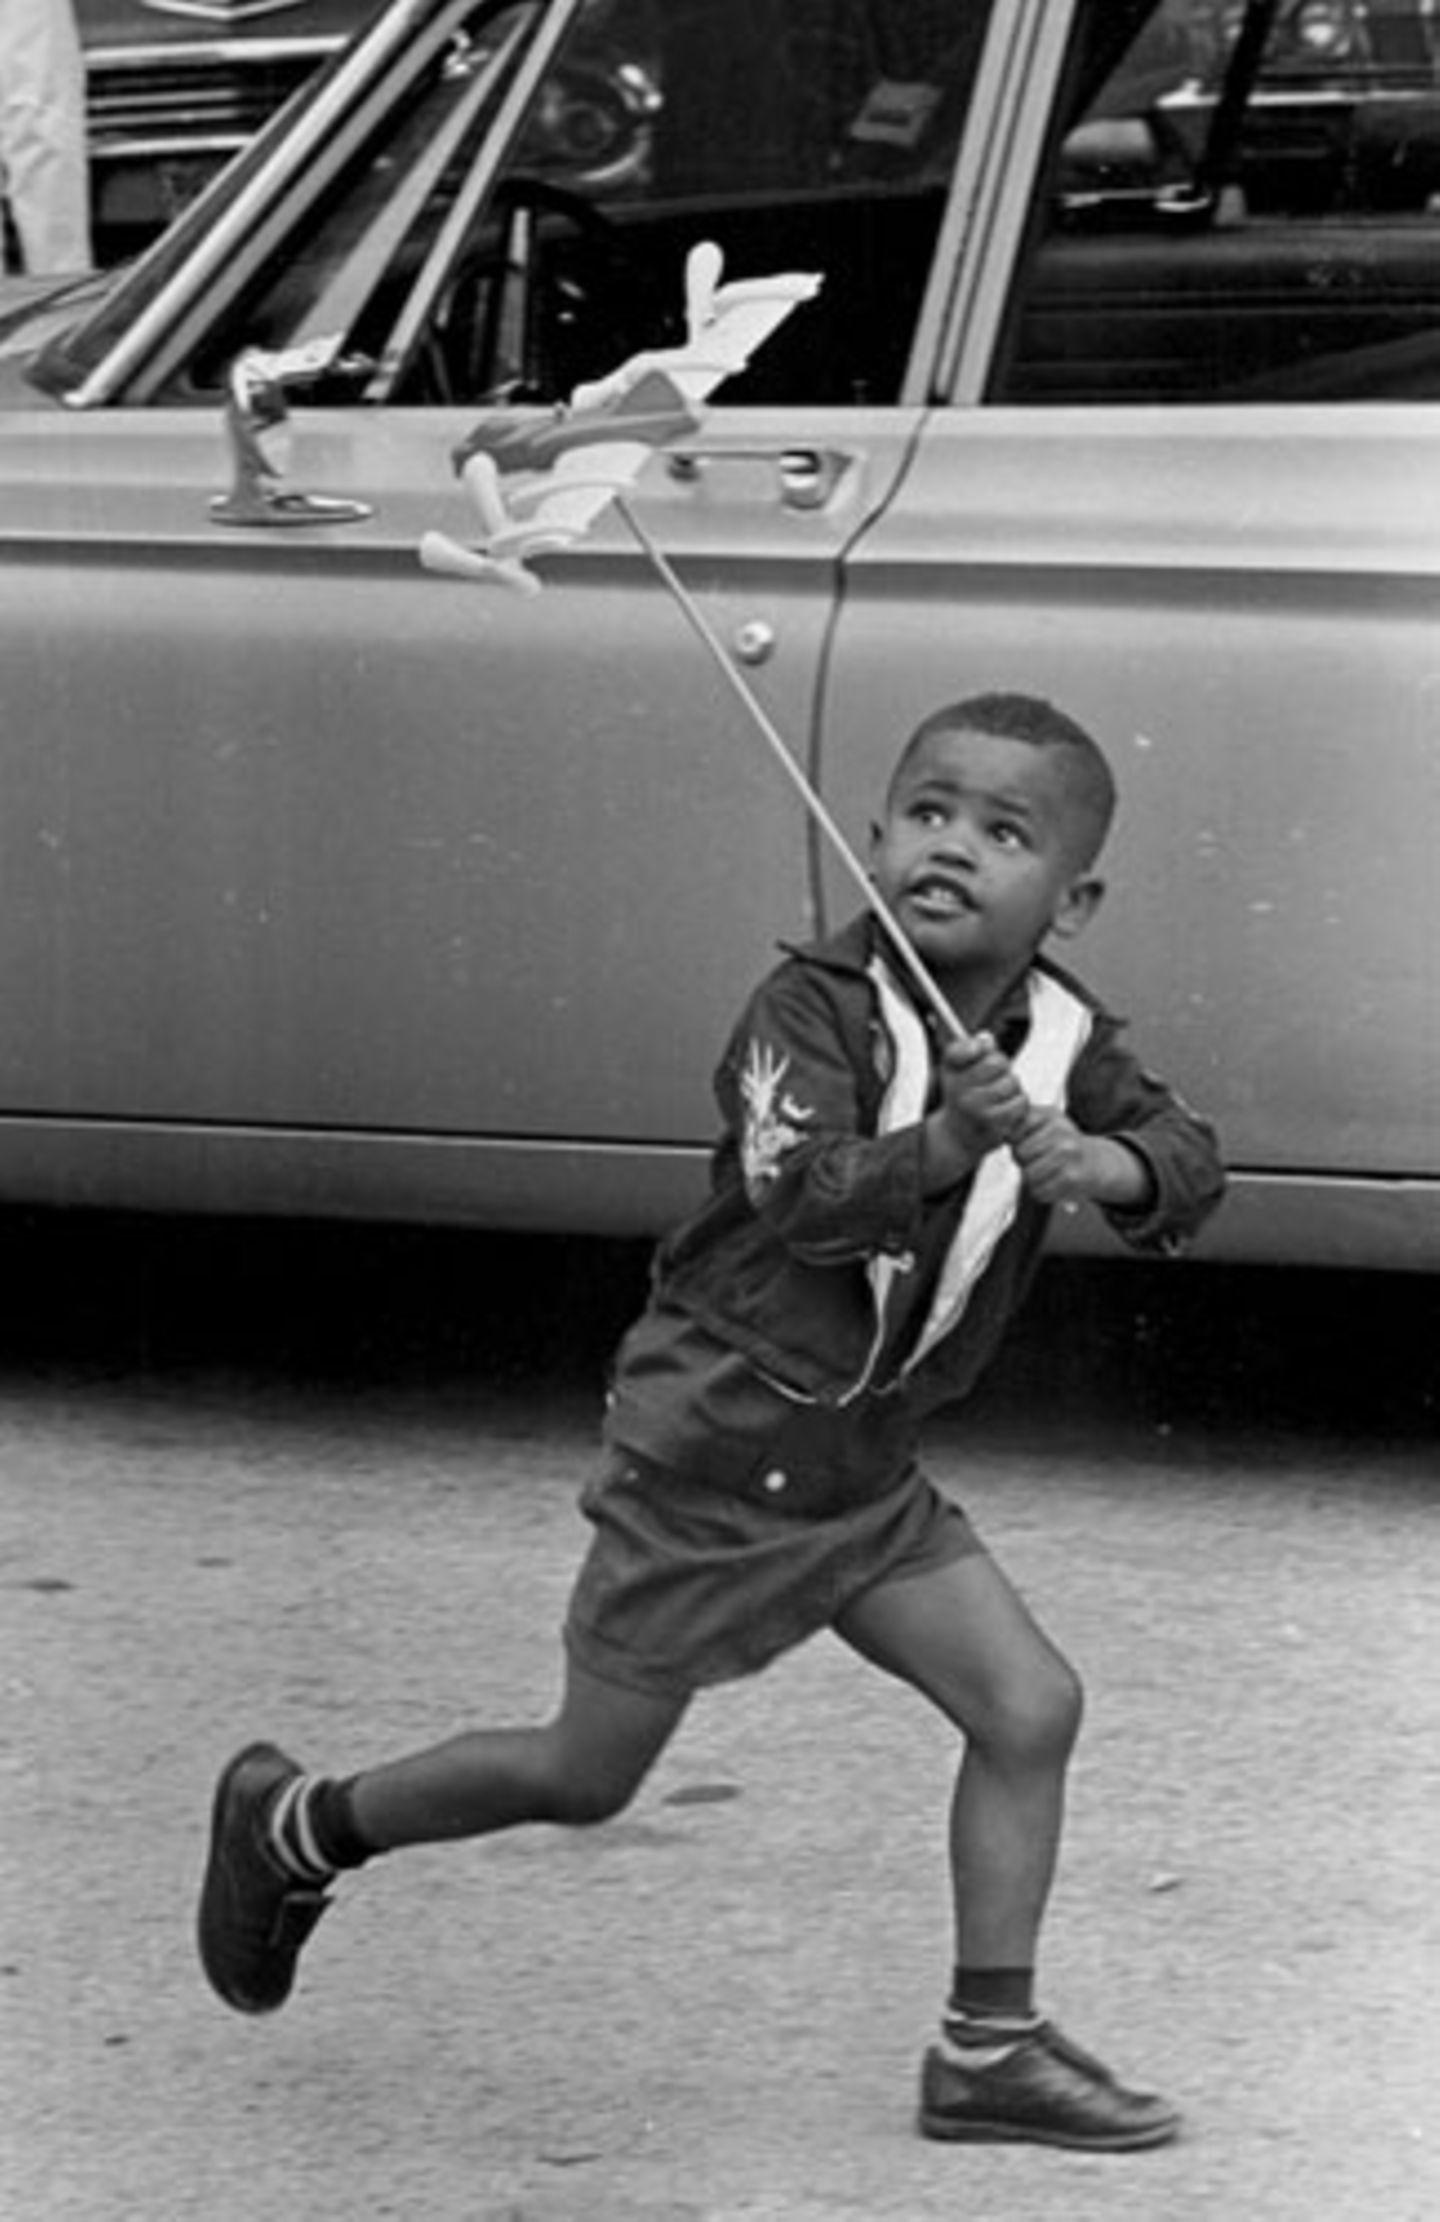 1965: Abflug in Chicago